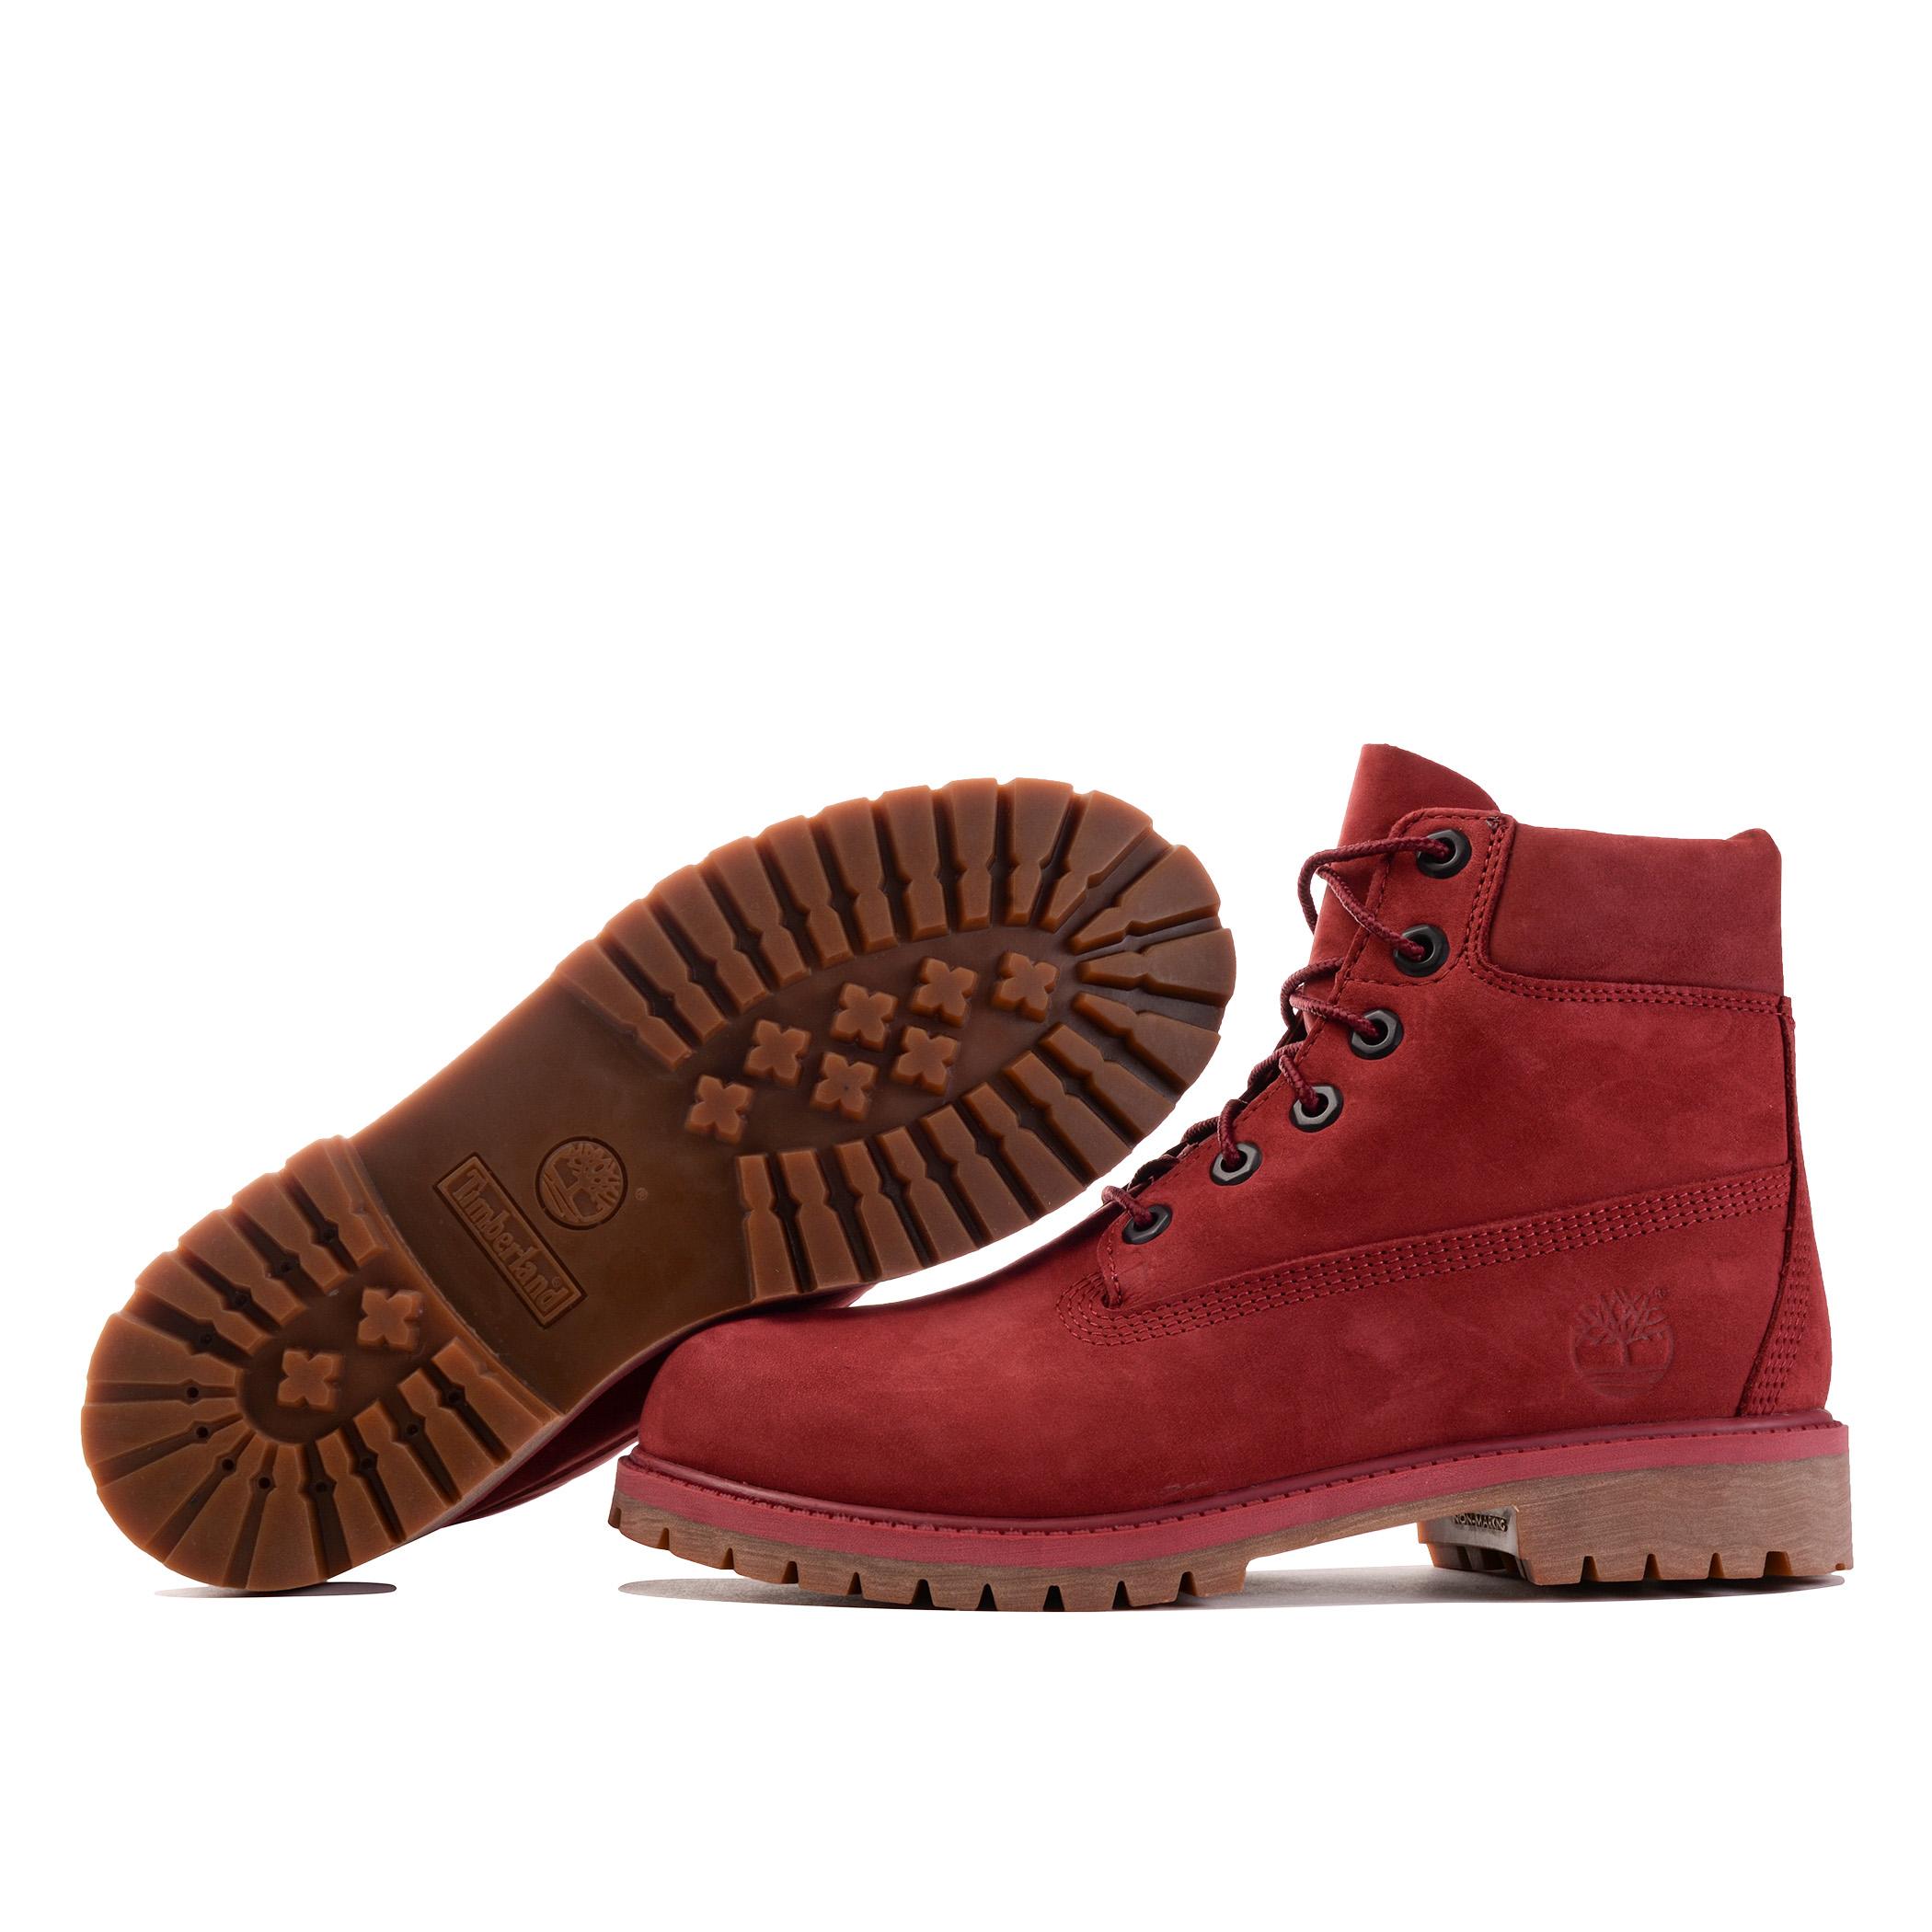 c562f10fdb66 Ботинки 6 Inch Premium от Timberland (TBLA1VCKM) - продажа, цена ...